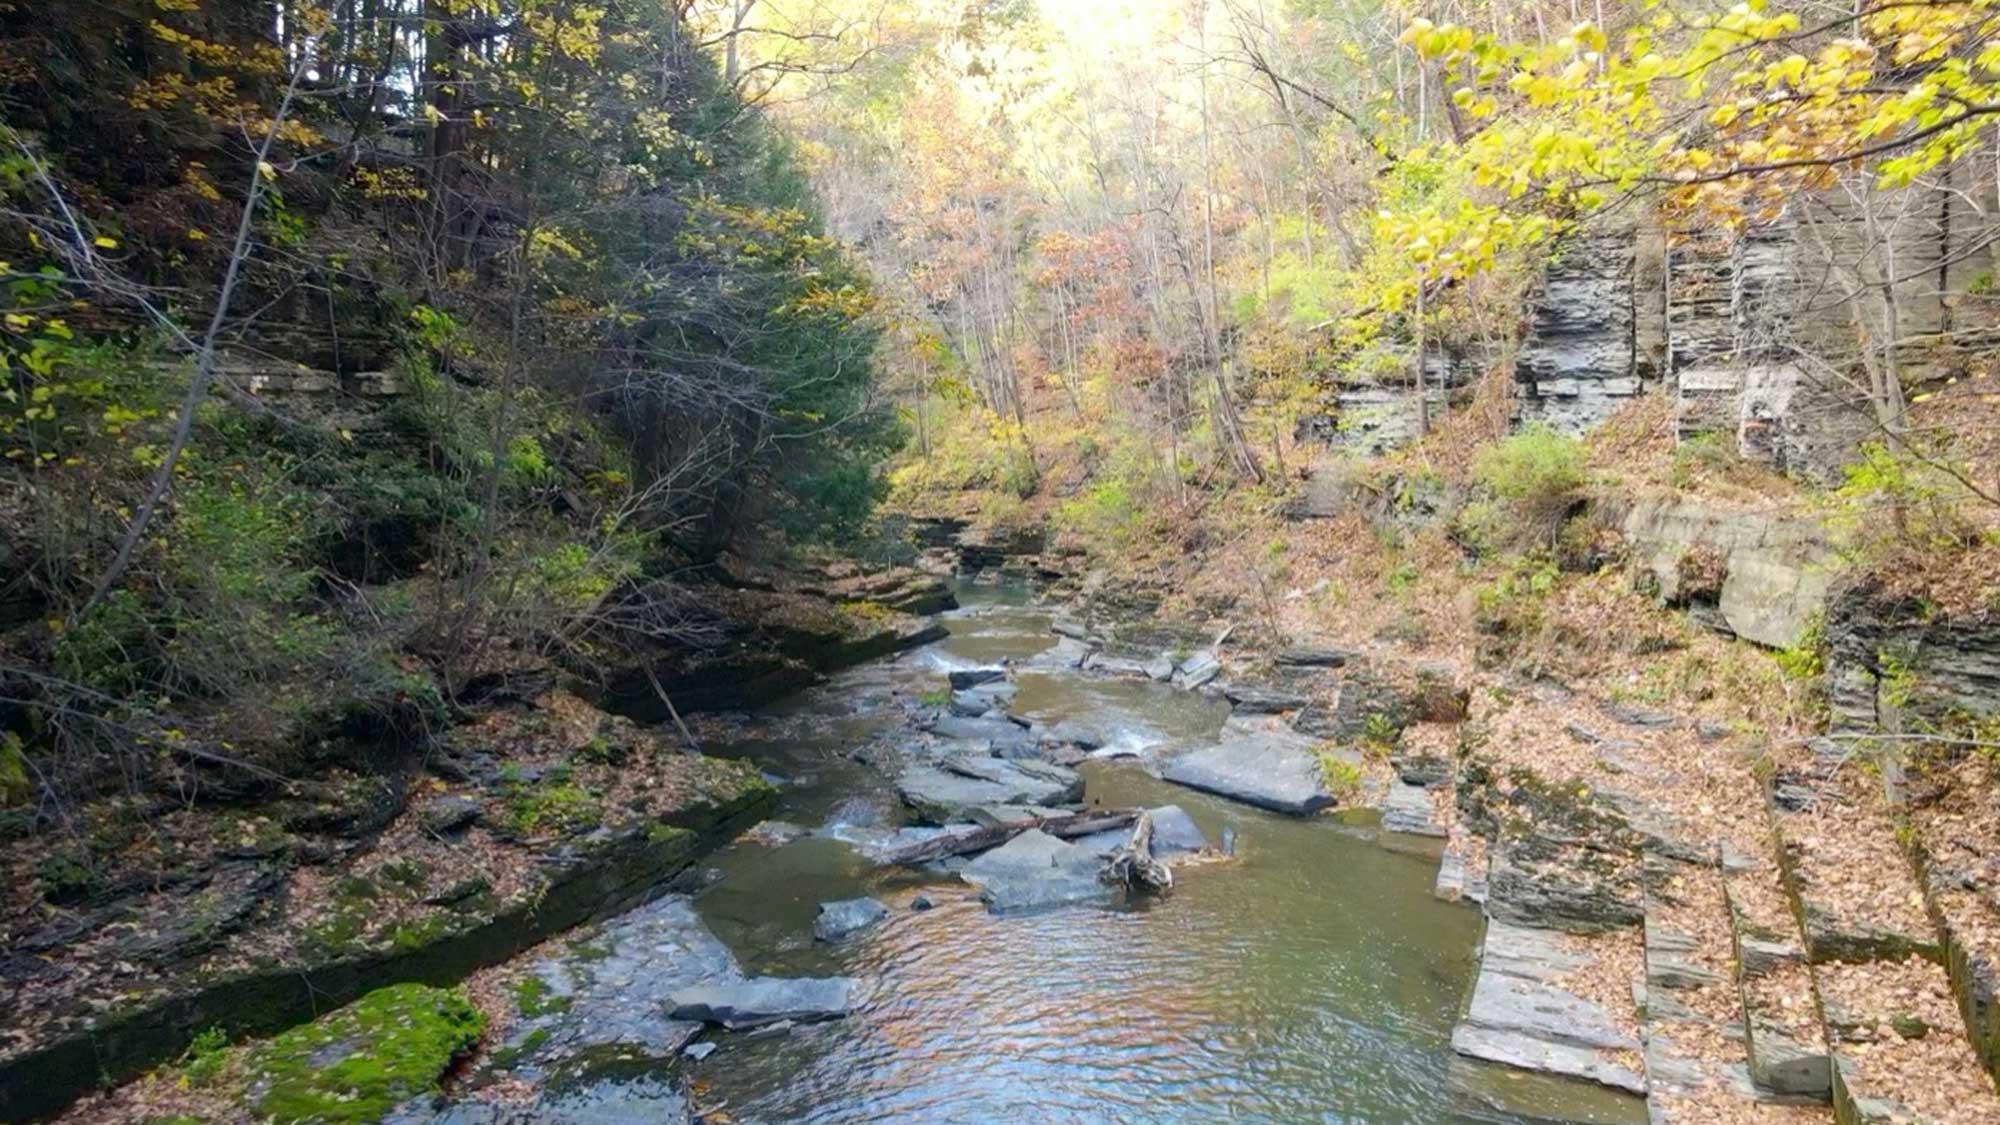 Photograph of Six Mile Creek.